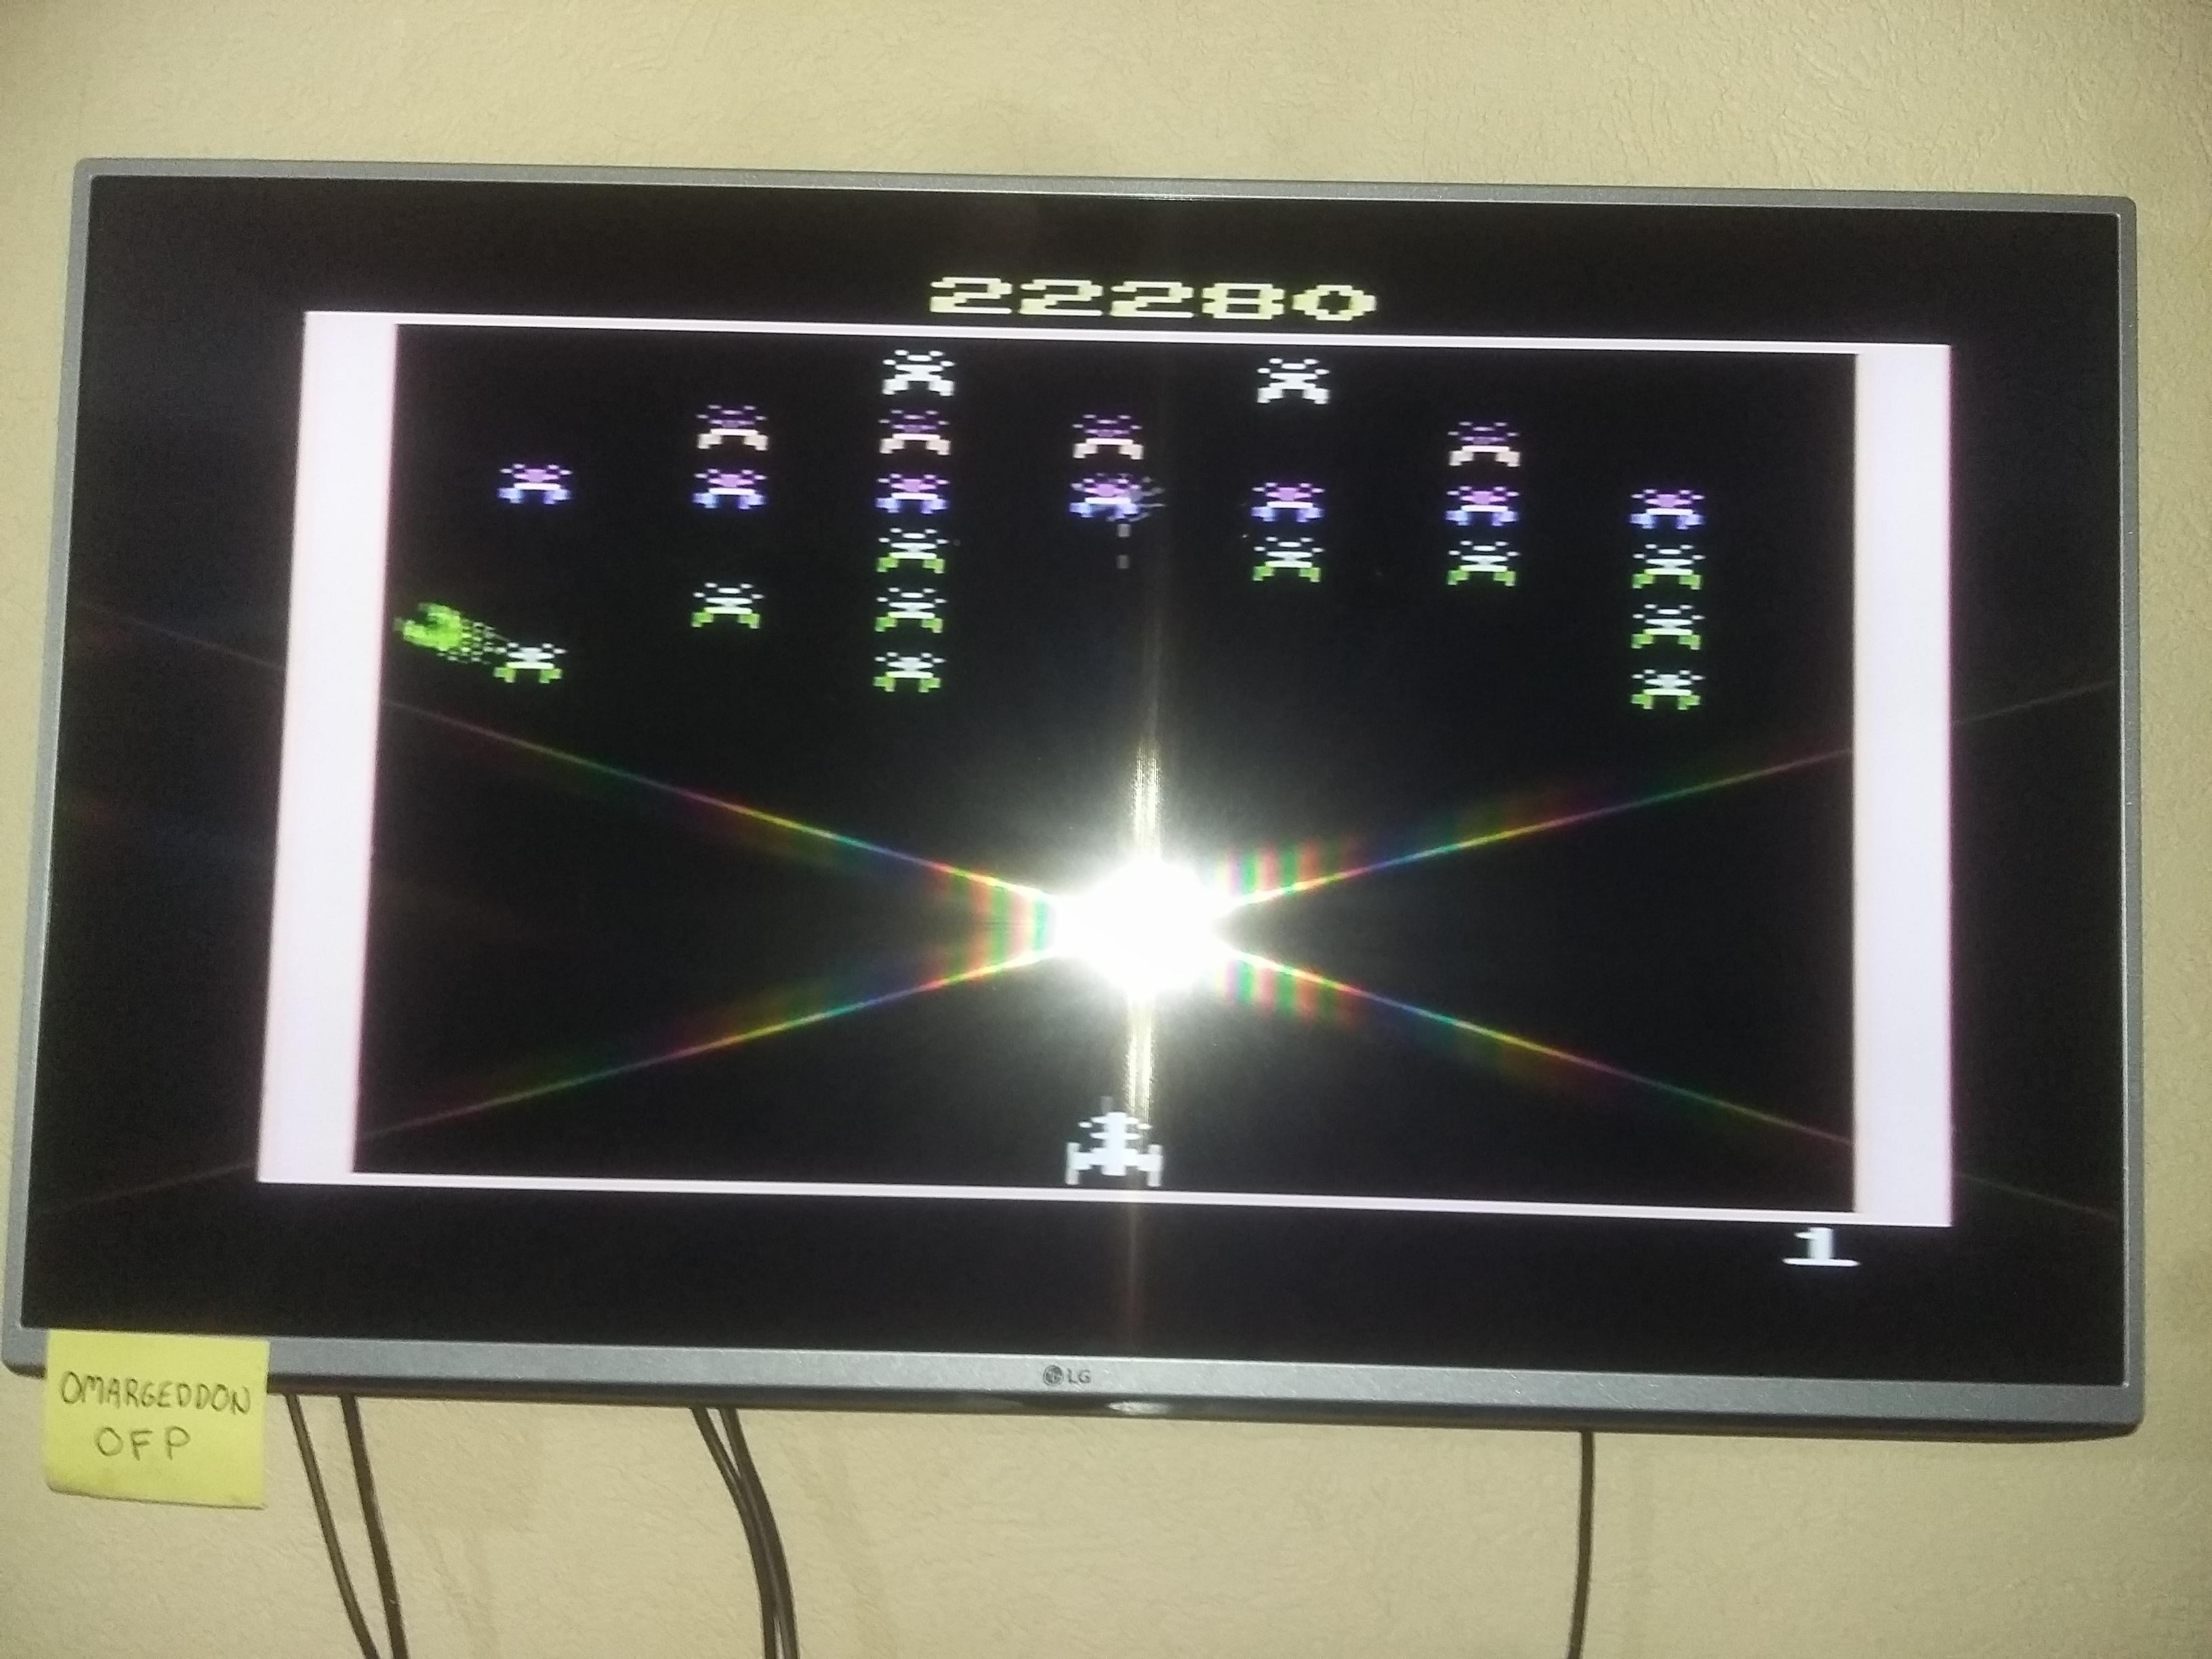 omargeddon: Galaxian (Atari 2600 Expert/A) 22,280 points on 2016-12-22 23:41:29